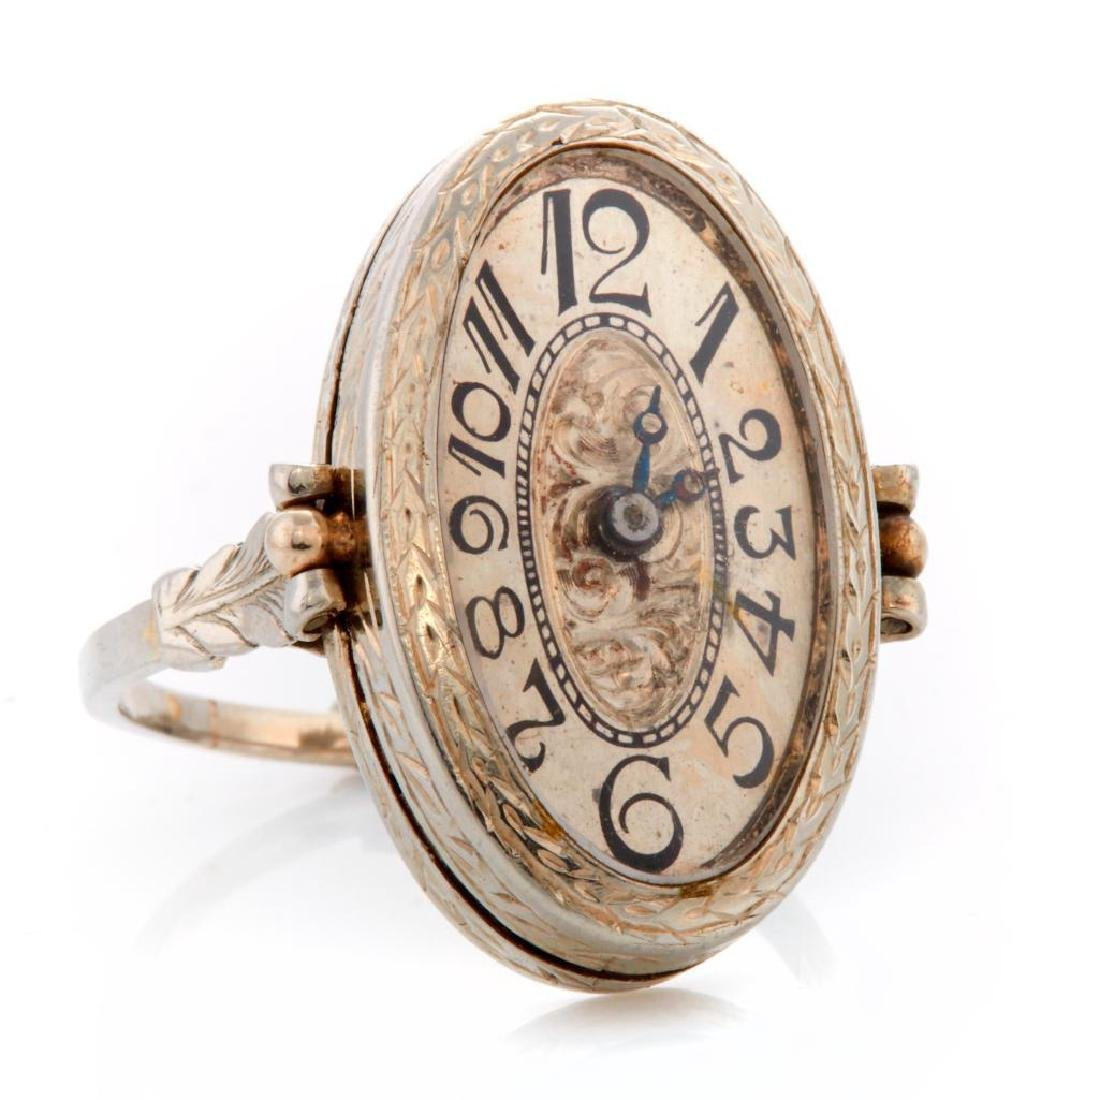 Art Deco Belais 18k white gold ring watch